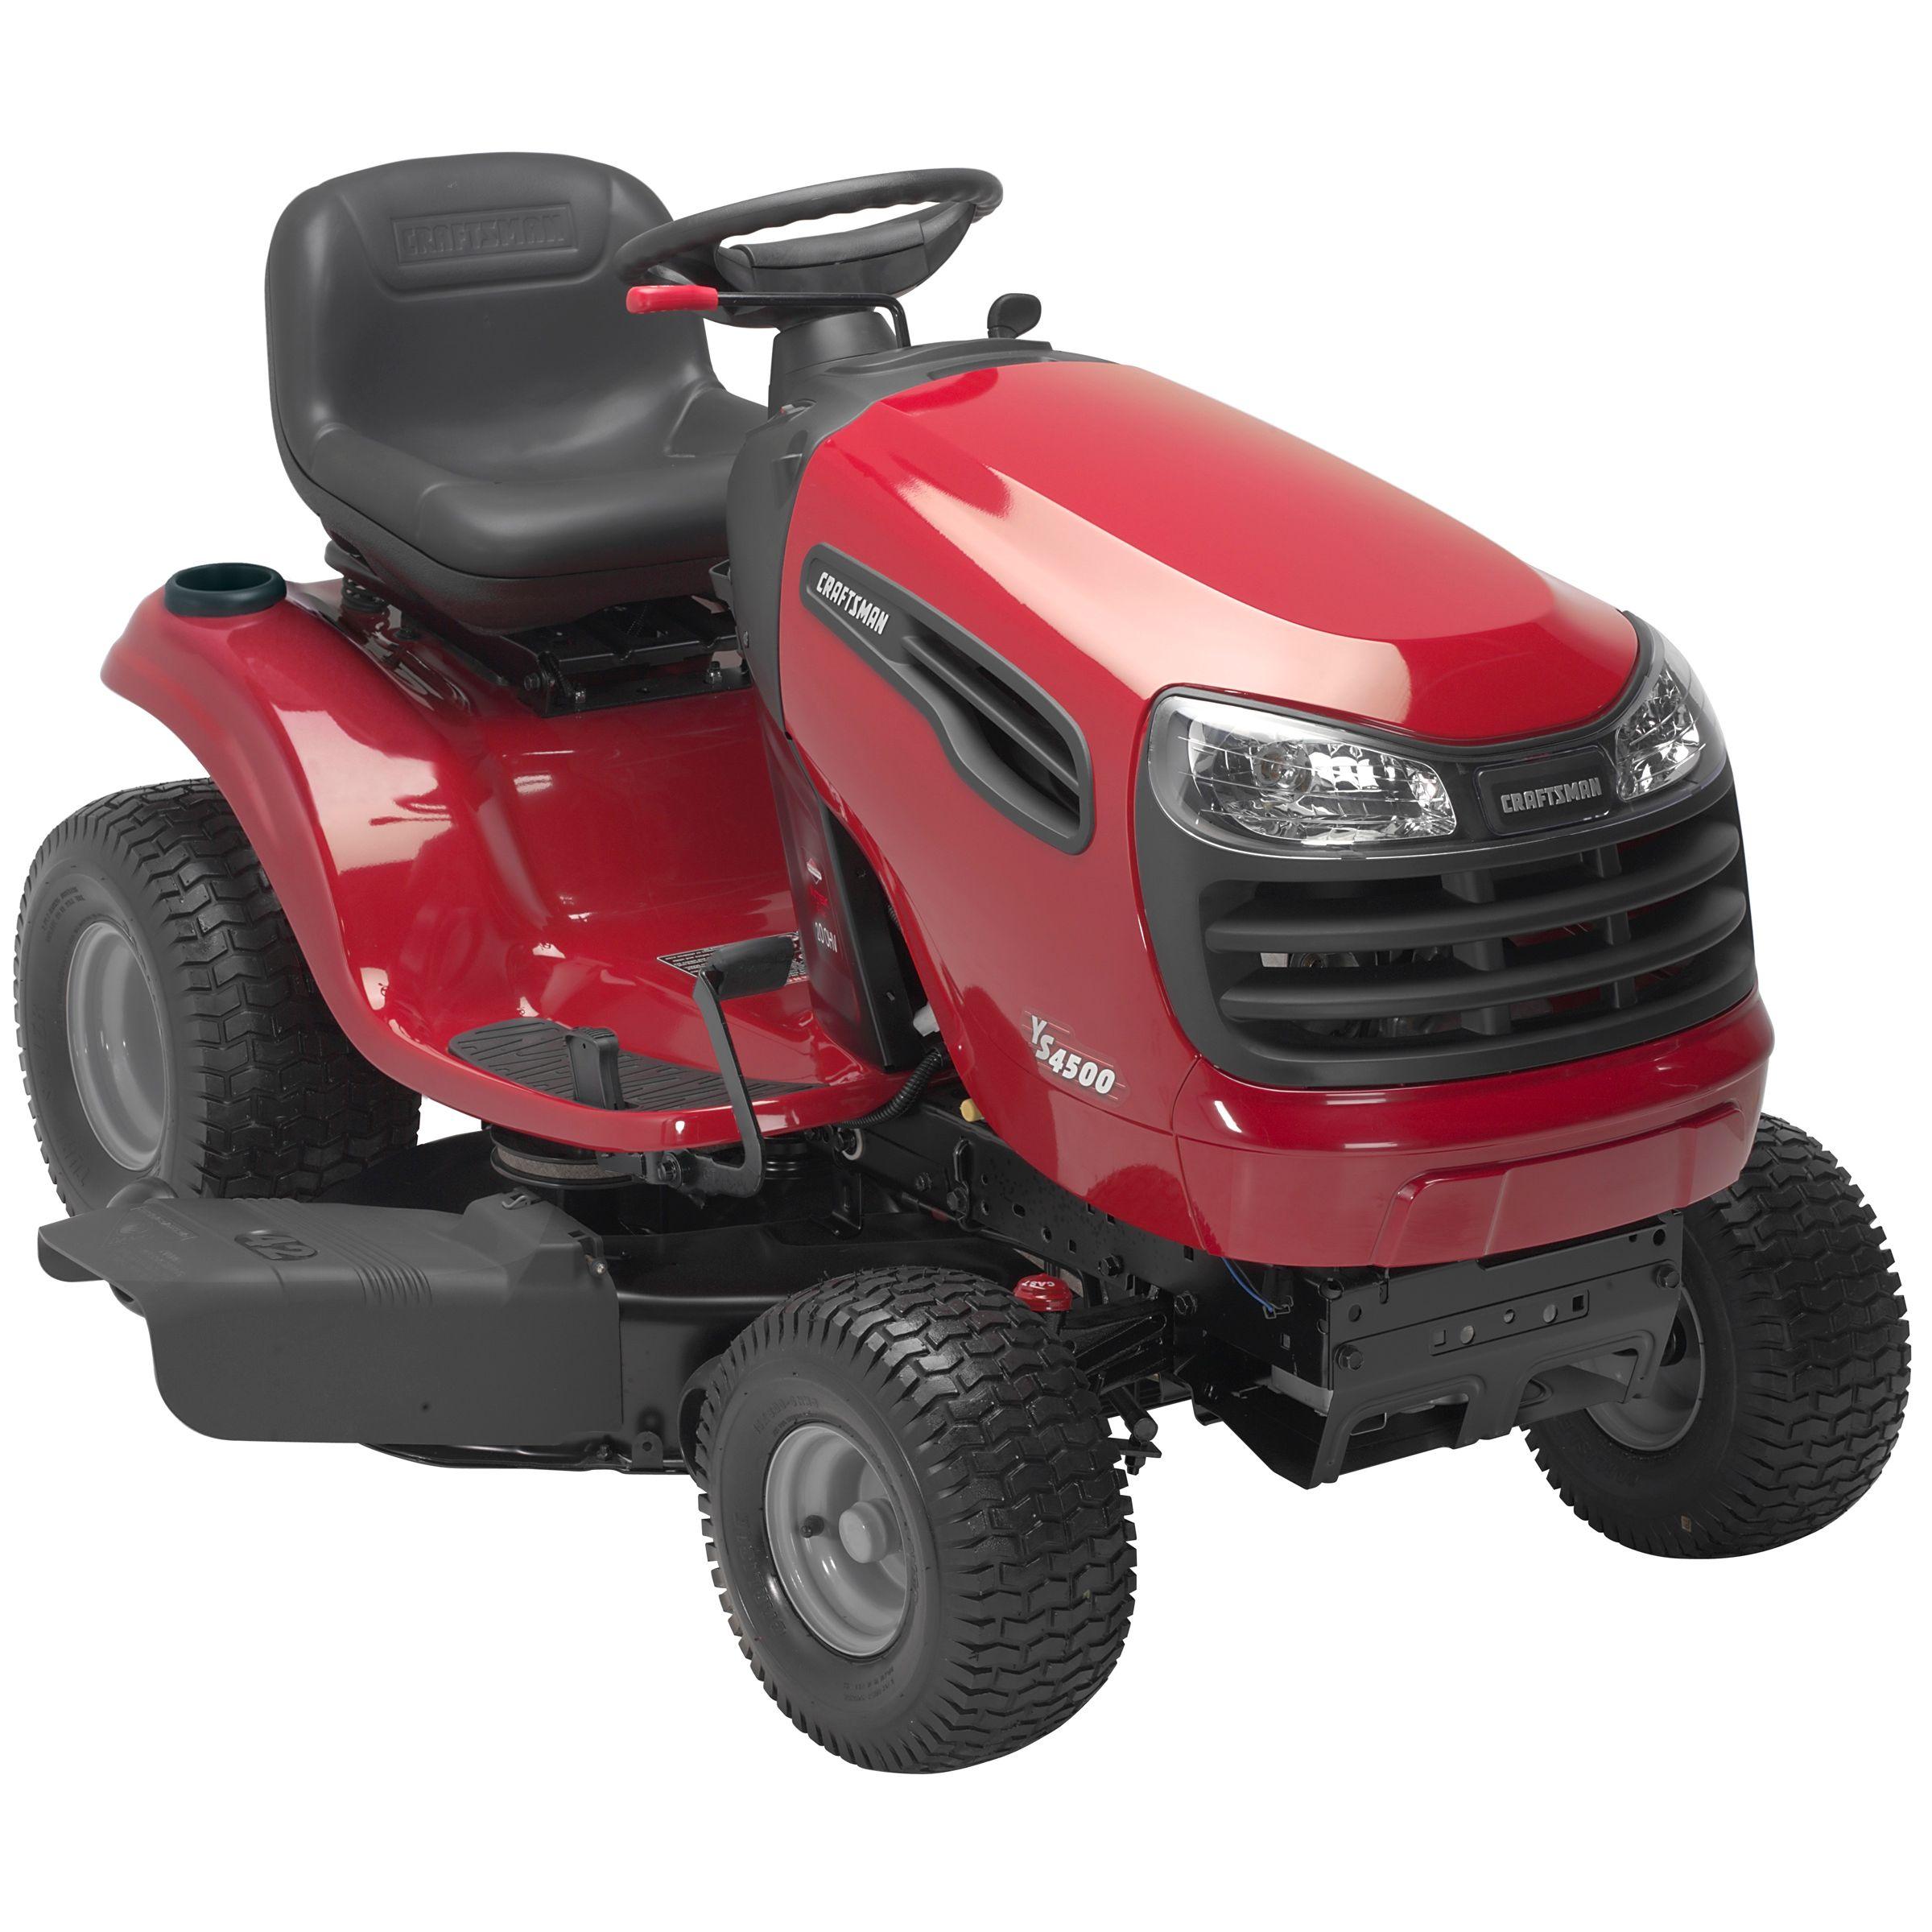 medium resolution of craftsman model 917288220 lawn tractor genuine parts lawn mower switch wiring diagram wiring diagram craftsman garden tractor 917 273761